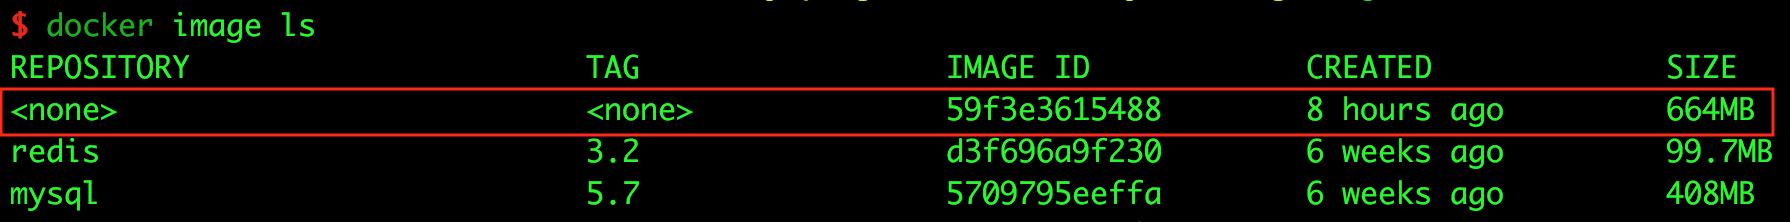 docker-image-pre-tag